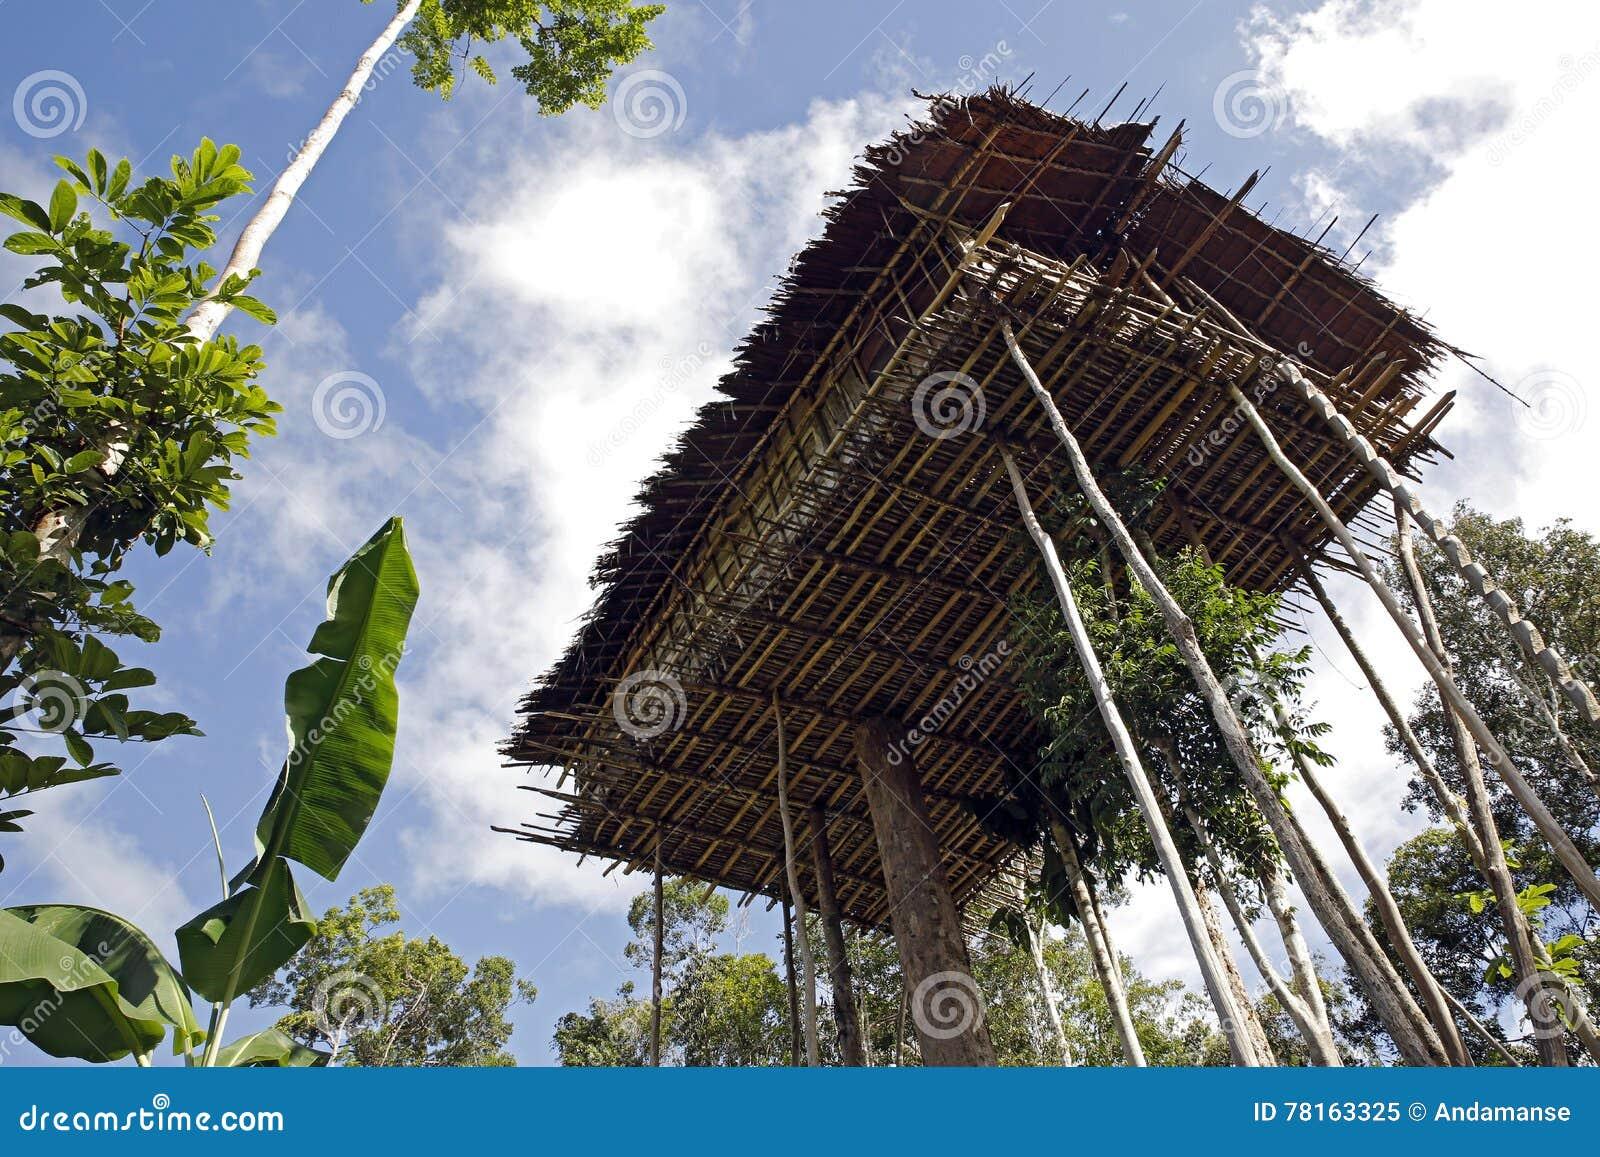 Picture of: Korowai Tree House Stock Image Image Of Lowland Treetop 78163325